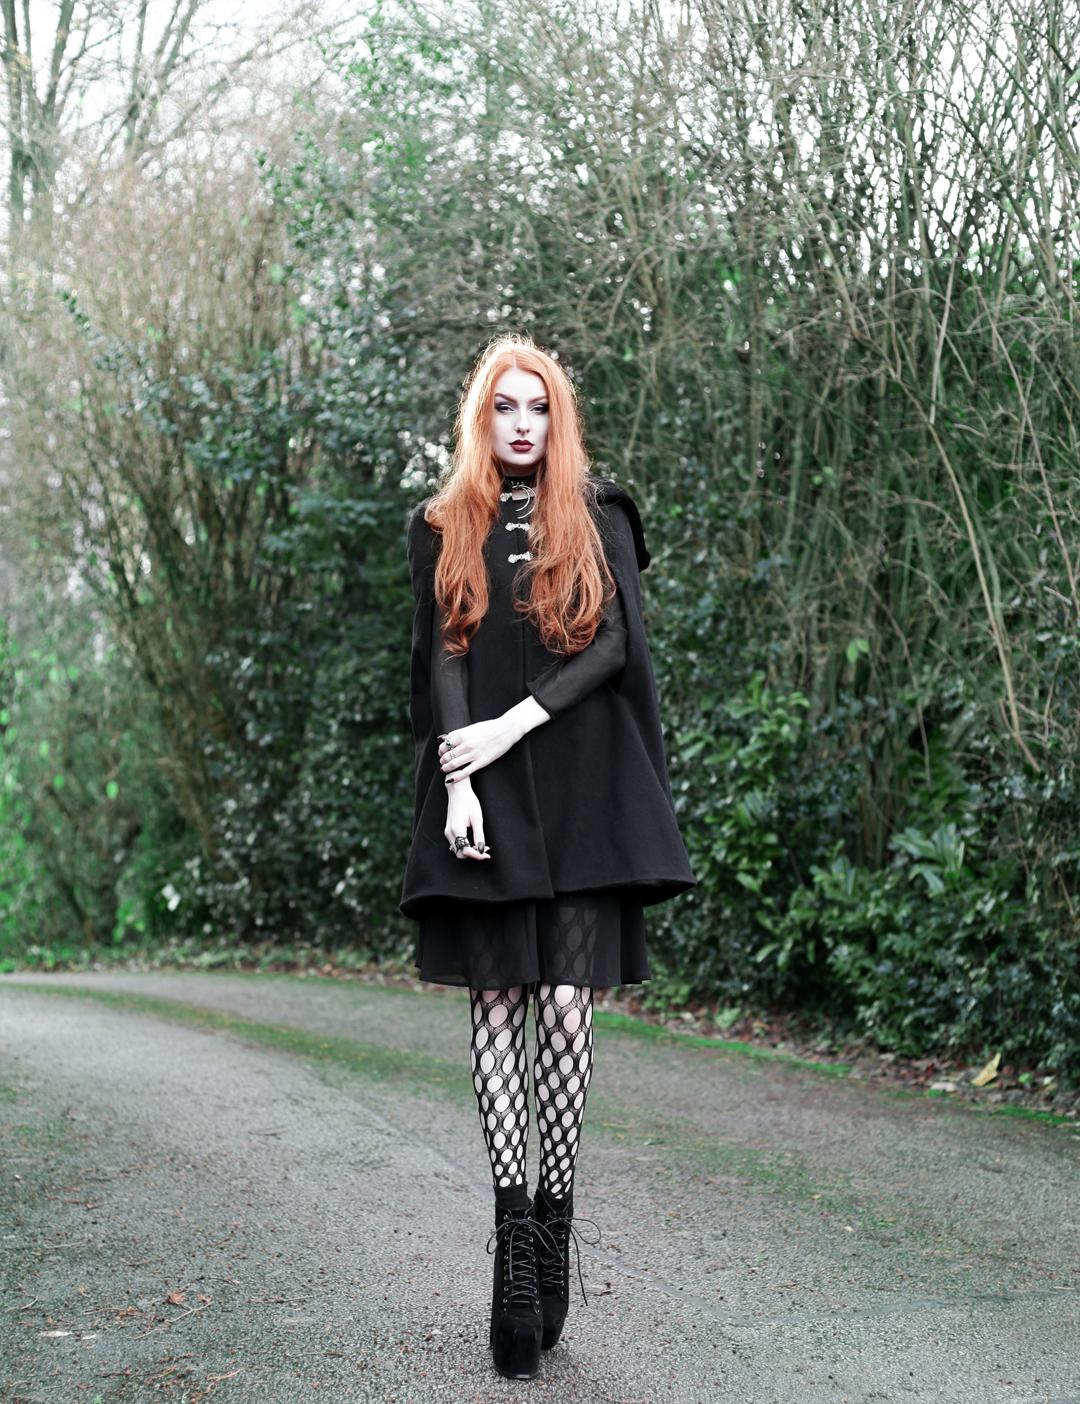 69c865701bc Olivia Emily wears Dark Thorn Clothing Myrtle Cape